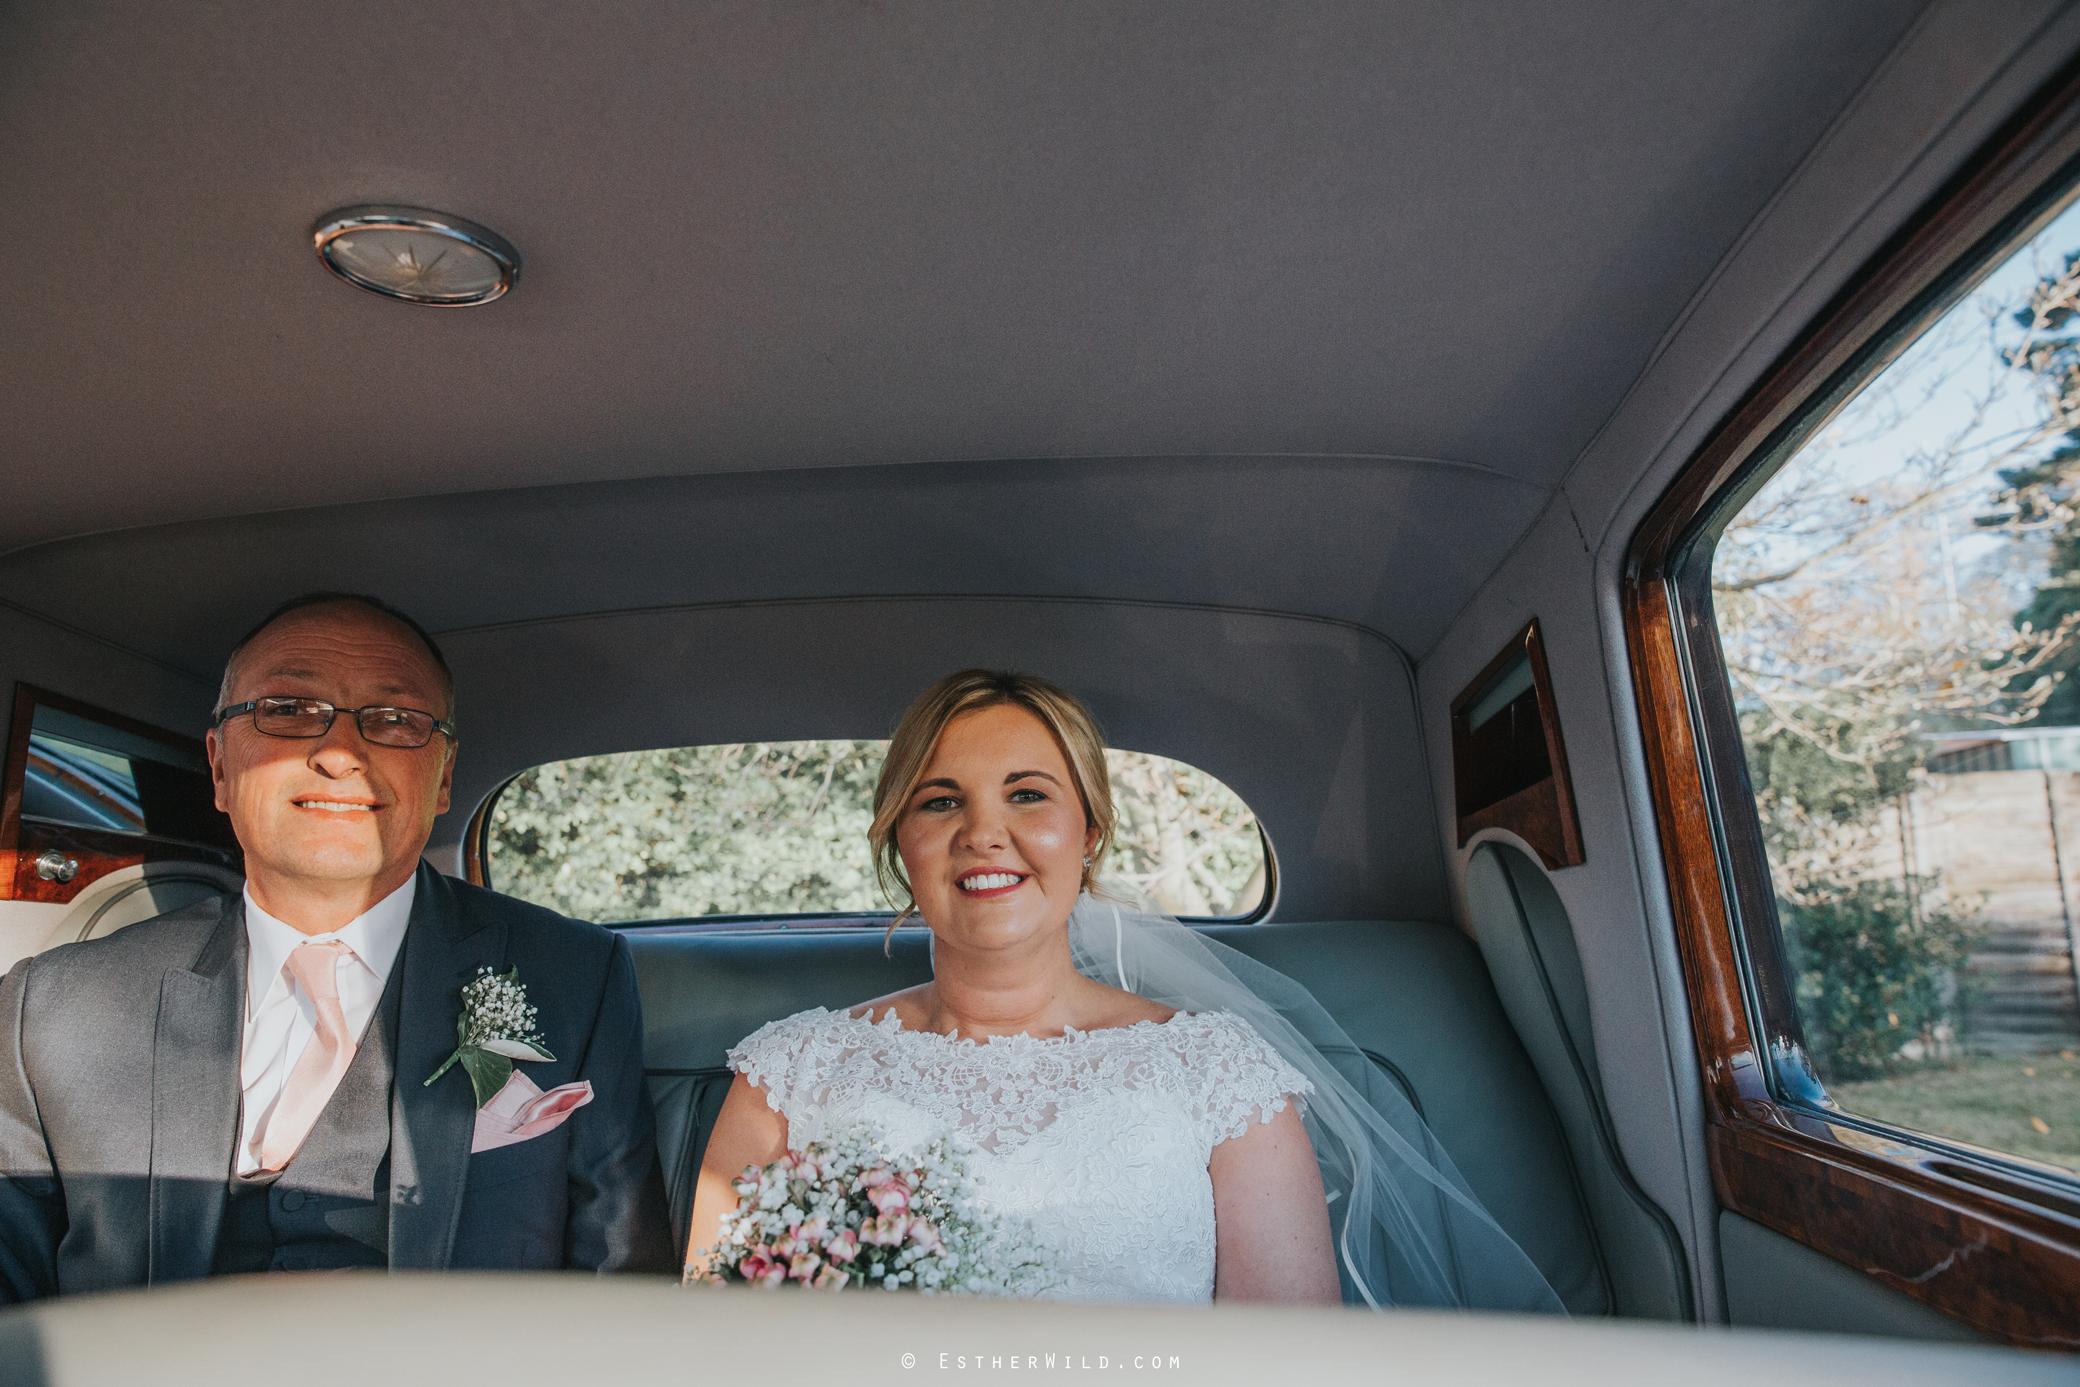 Wedding_Kings_Lynn_Town_Hall_Norfolk_Photographer_Esther_Wild_IMG_0786.jpg